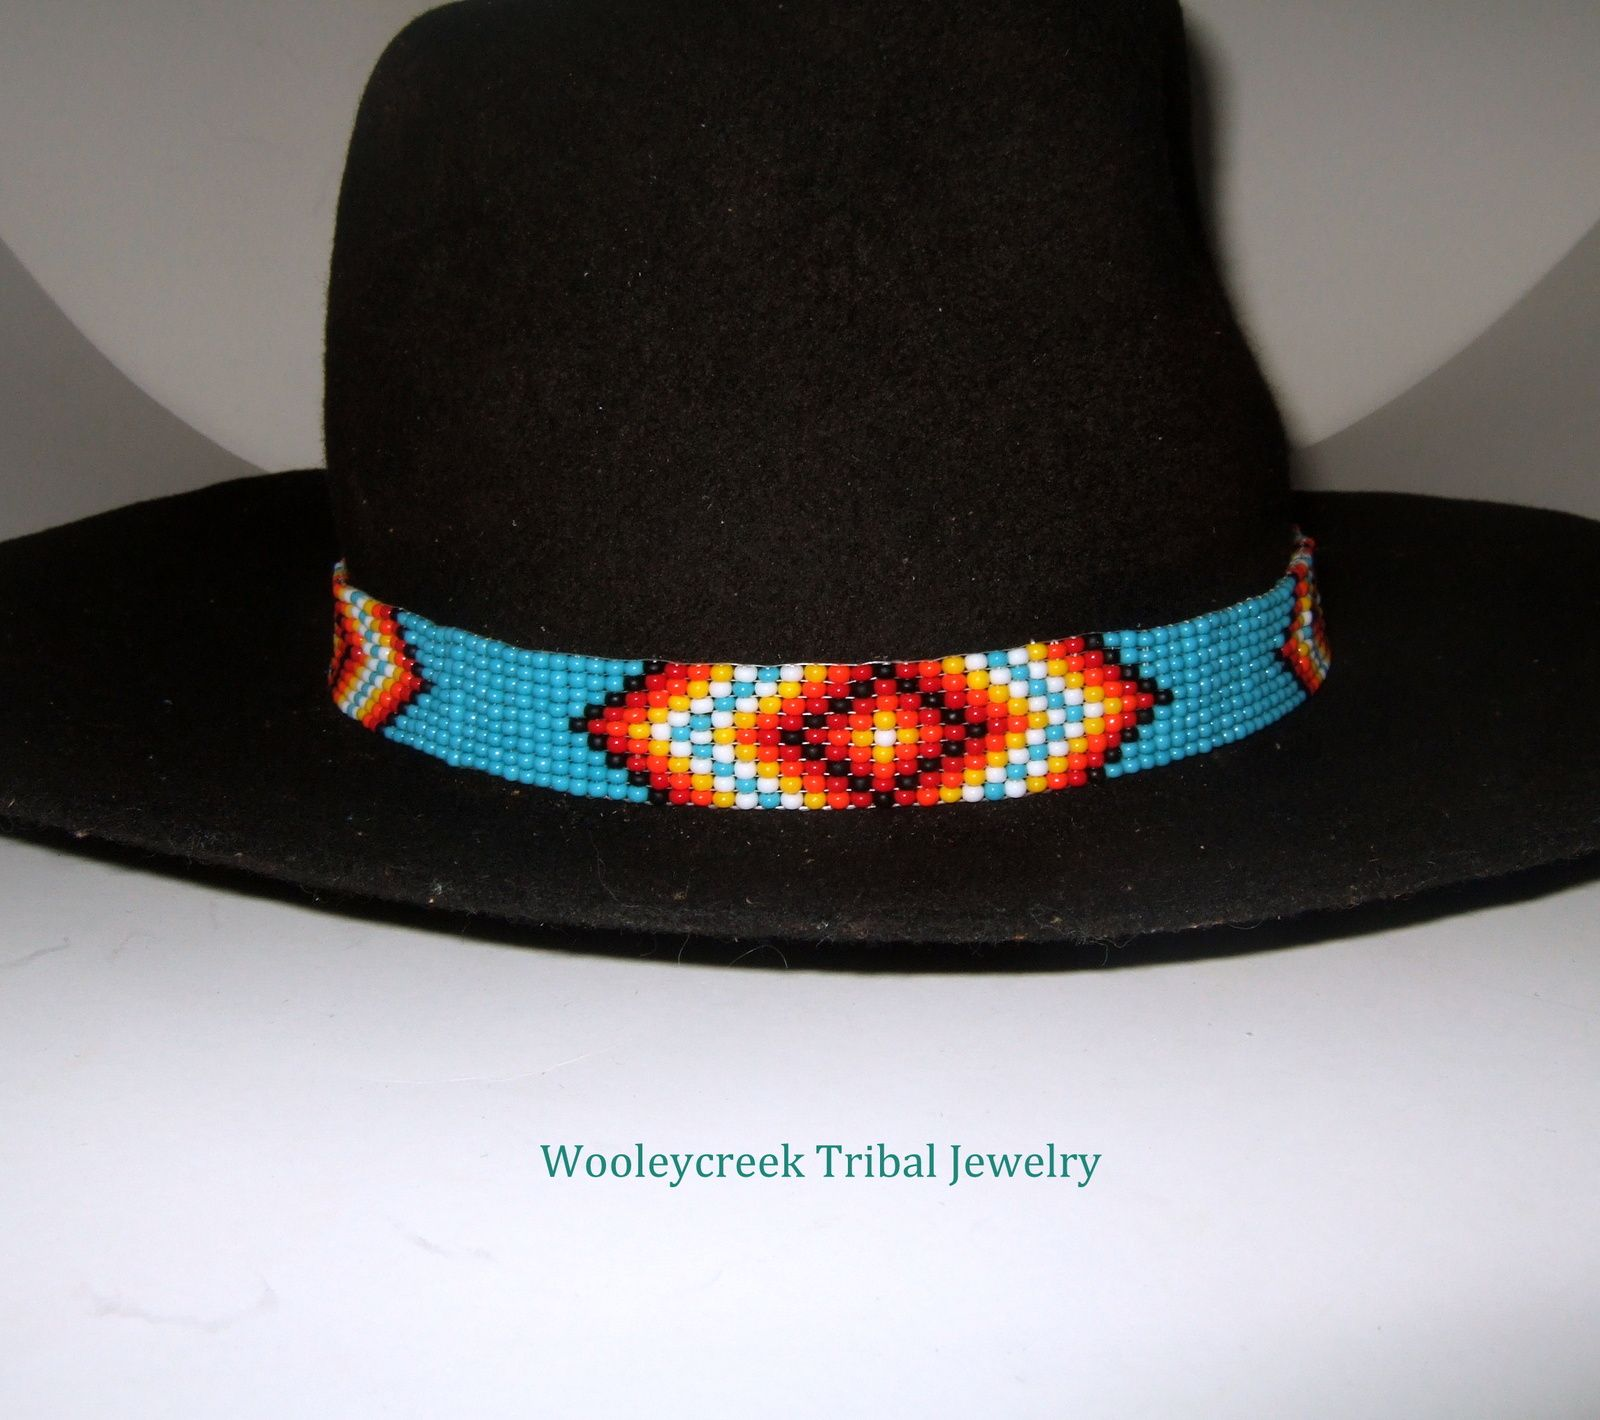 Beaded Hatband With Tribal Geometric Loom Work Motif Beaded Hat Bands Beaded Hatband Winter Hats For Men